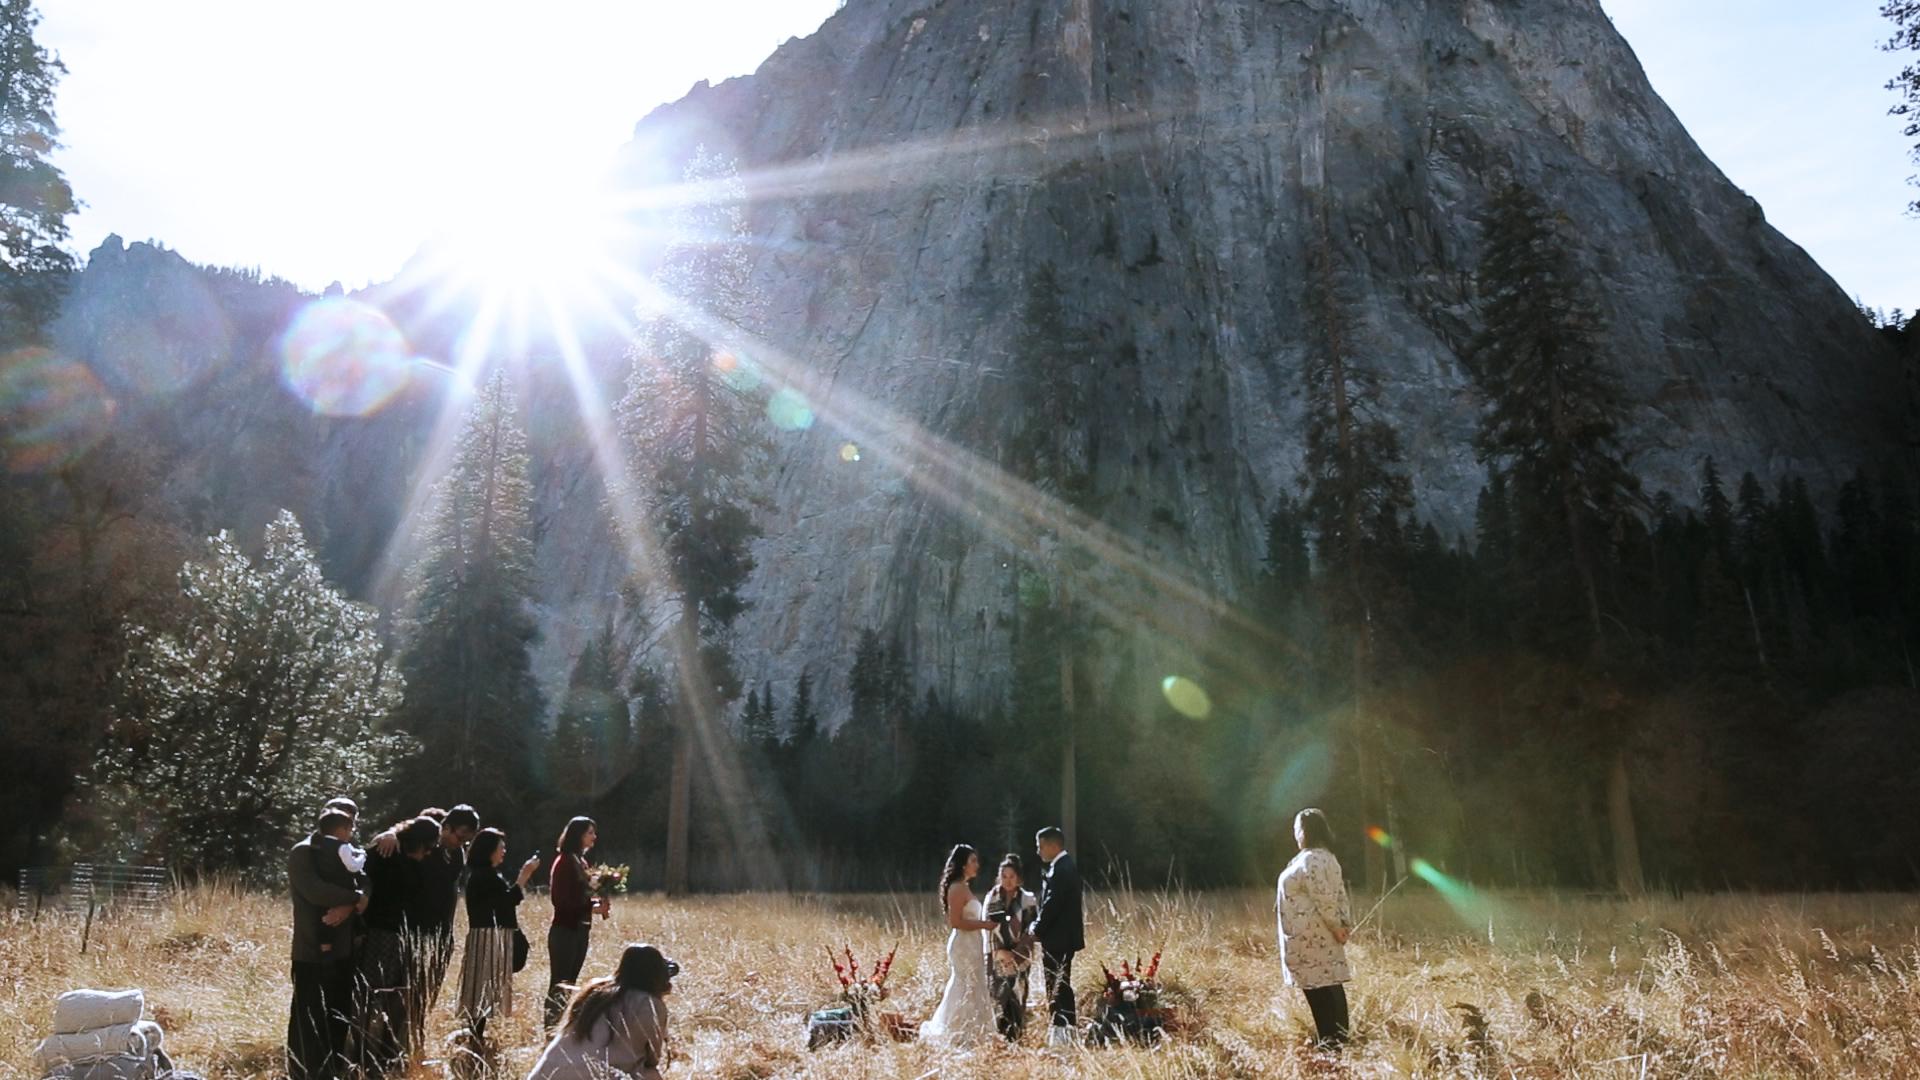 Yosemite National Park Elopement - Elopement Videographer - Destination Elopement Photographer - El Capitan Meadow Wedding